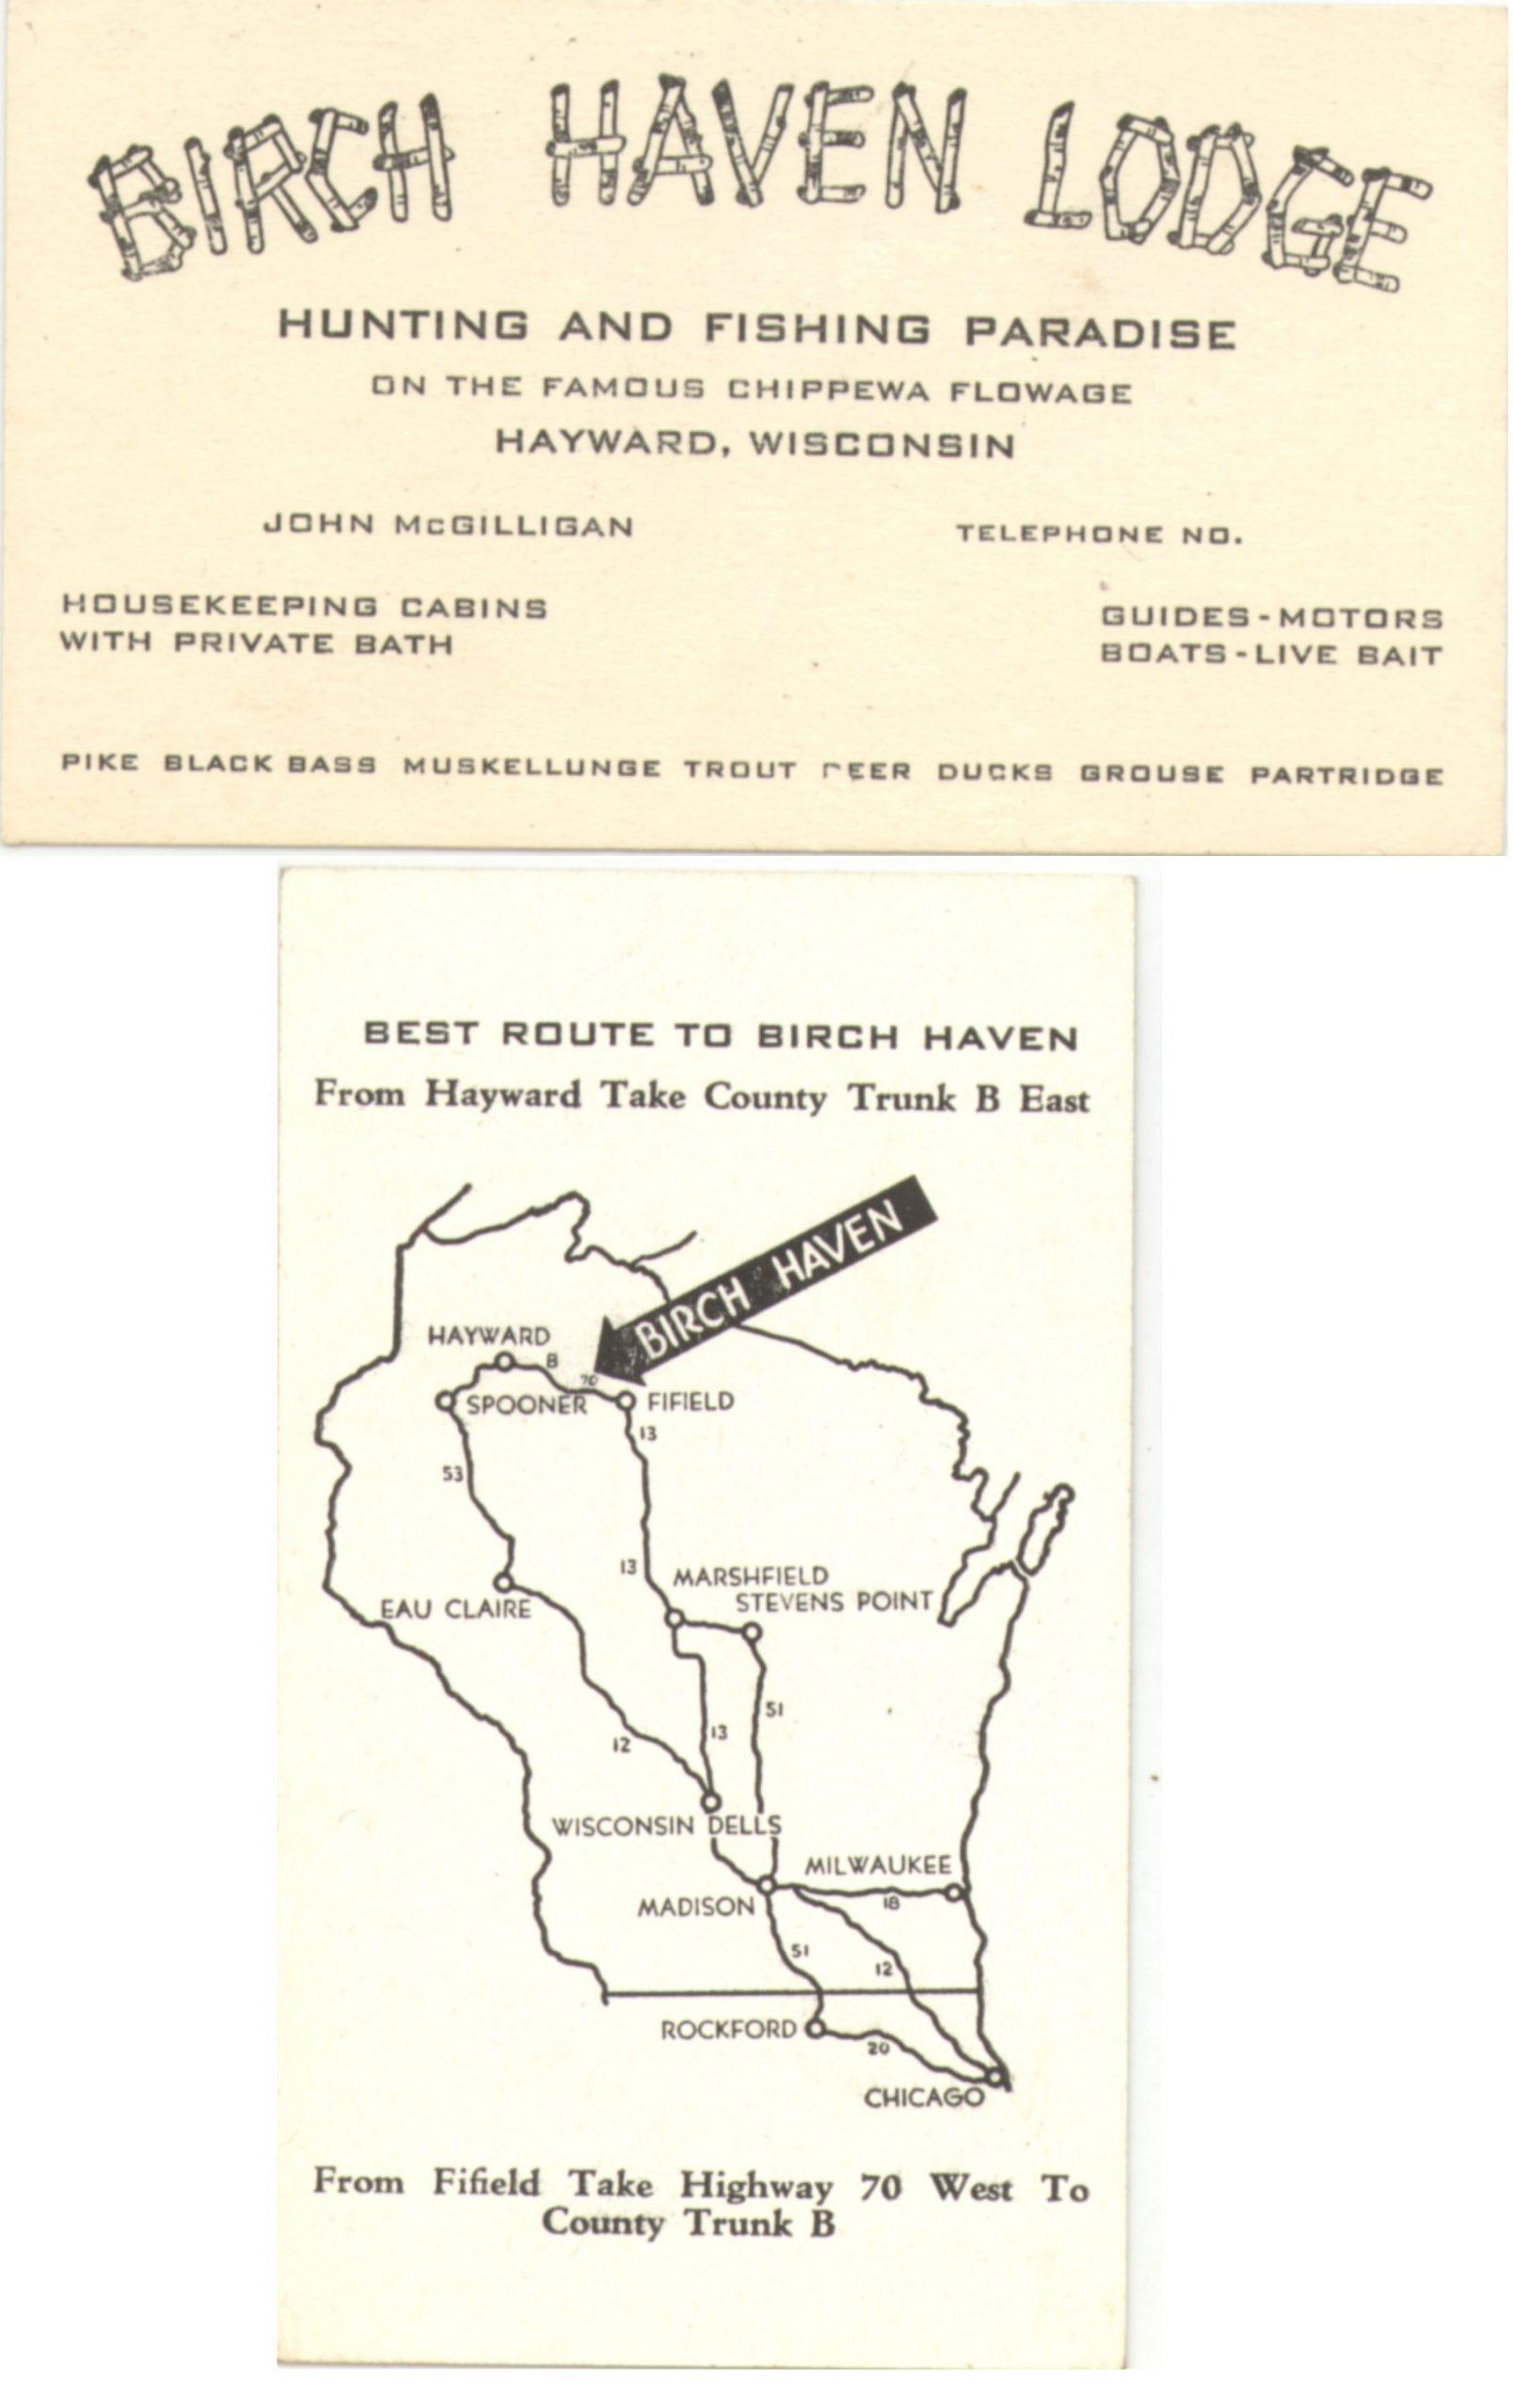 Birch Haven Lodge - Lake Chippewa Flowage